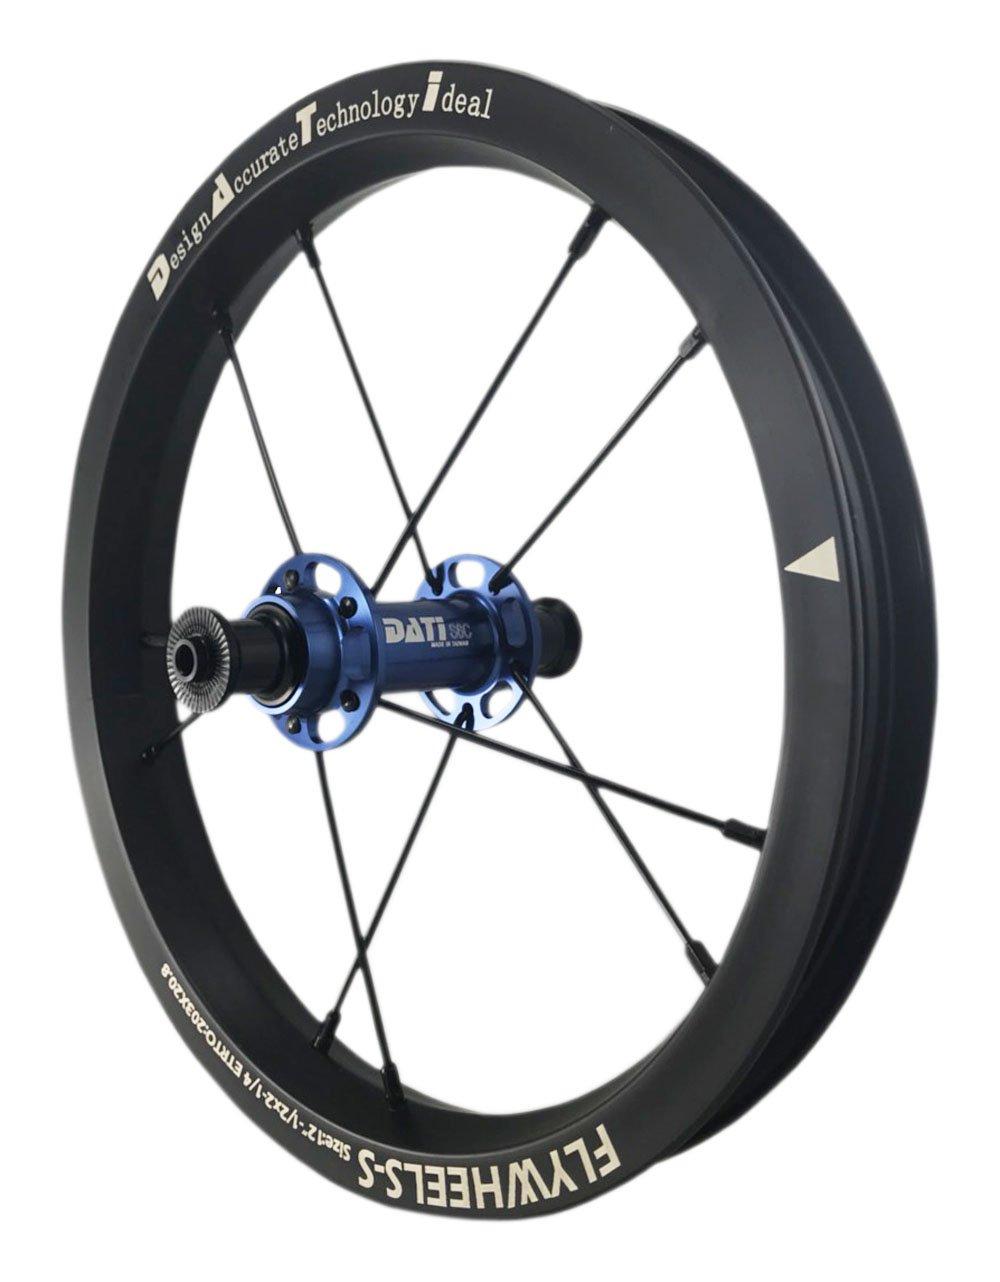 NEW DATI S6C-W AlloyPush Kids Balance Bike Bicycle Super light wheels Set 12'' F+R (Blue, 95X8mm for(Strider))